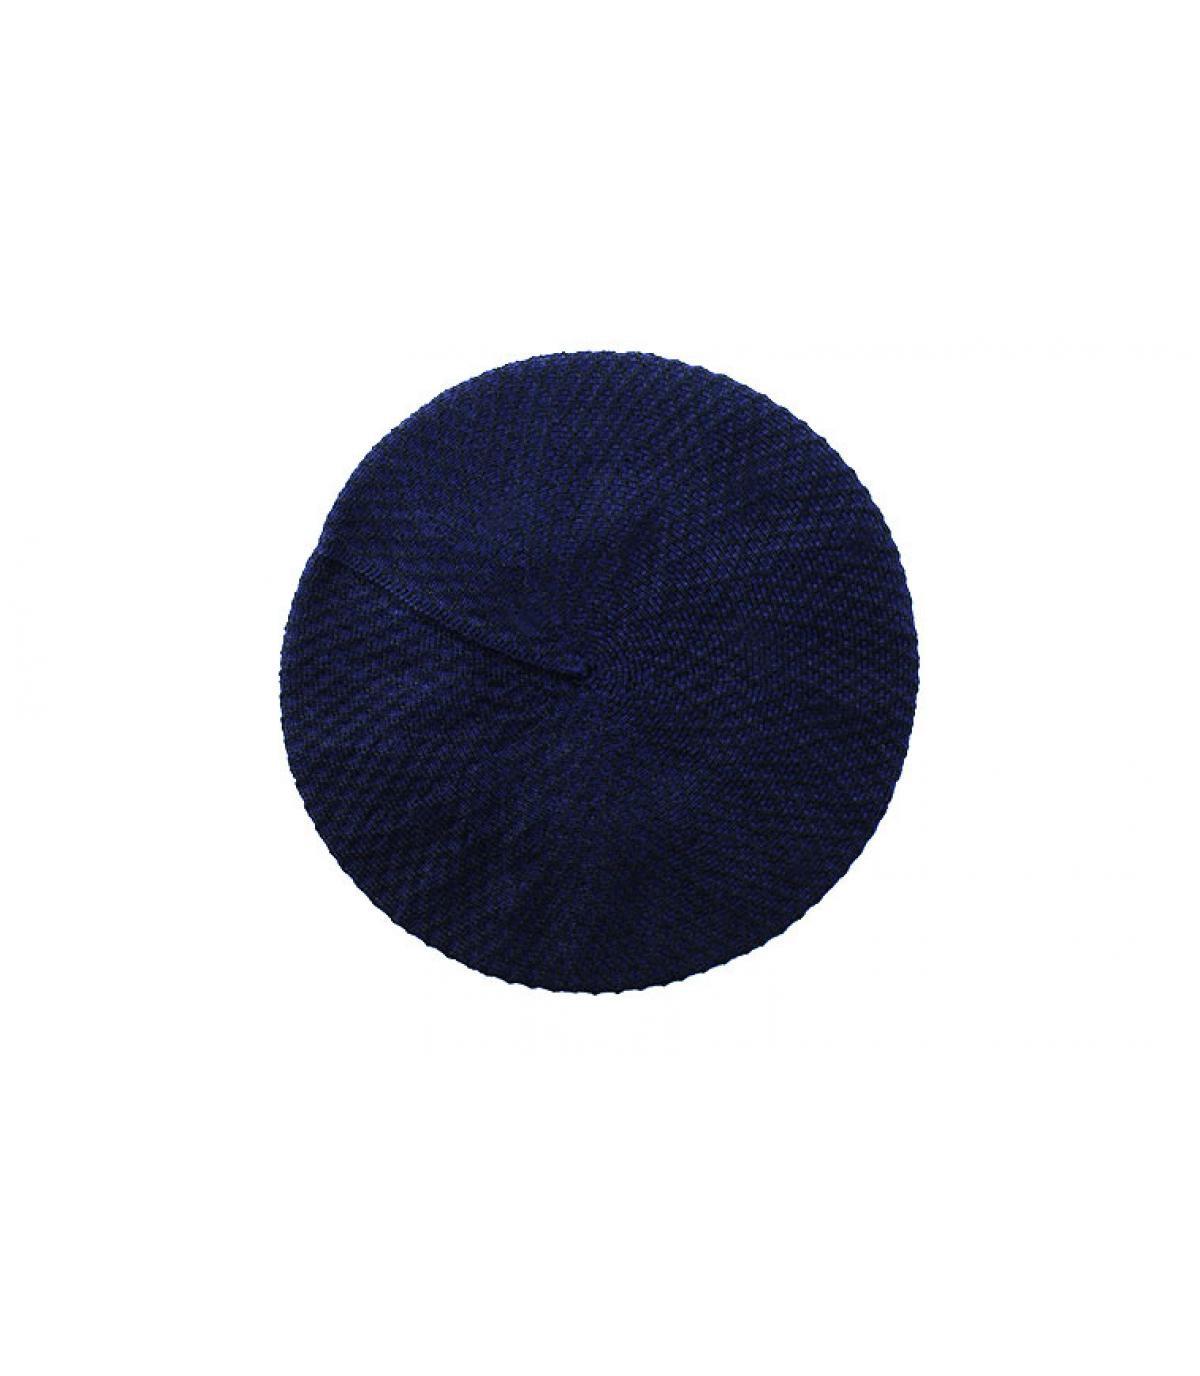 Dettagli Béret Cotton midnight - image 2